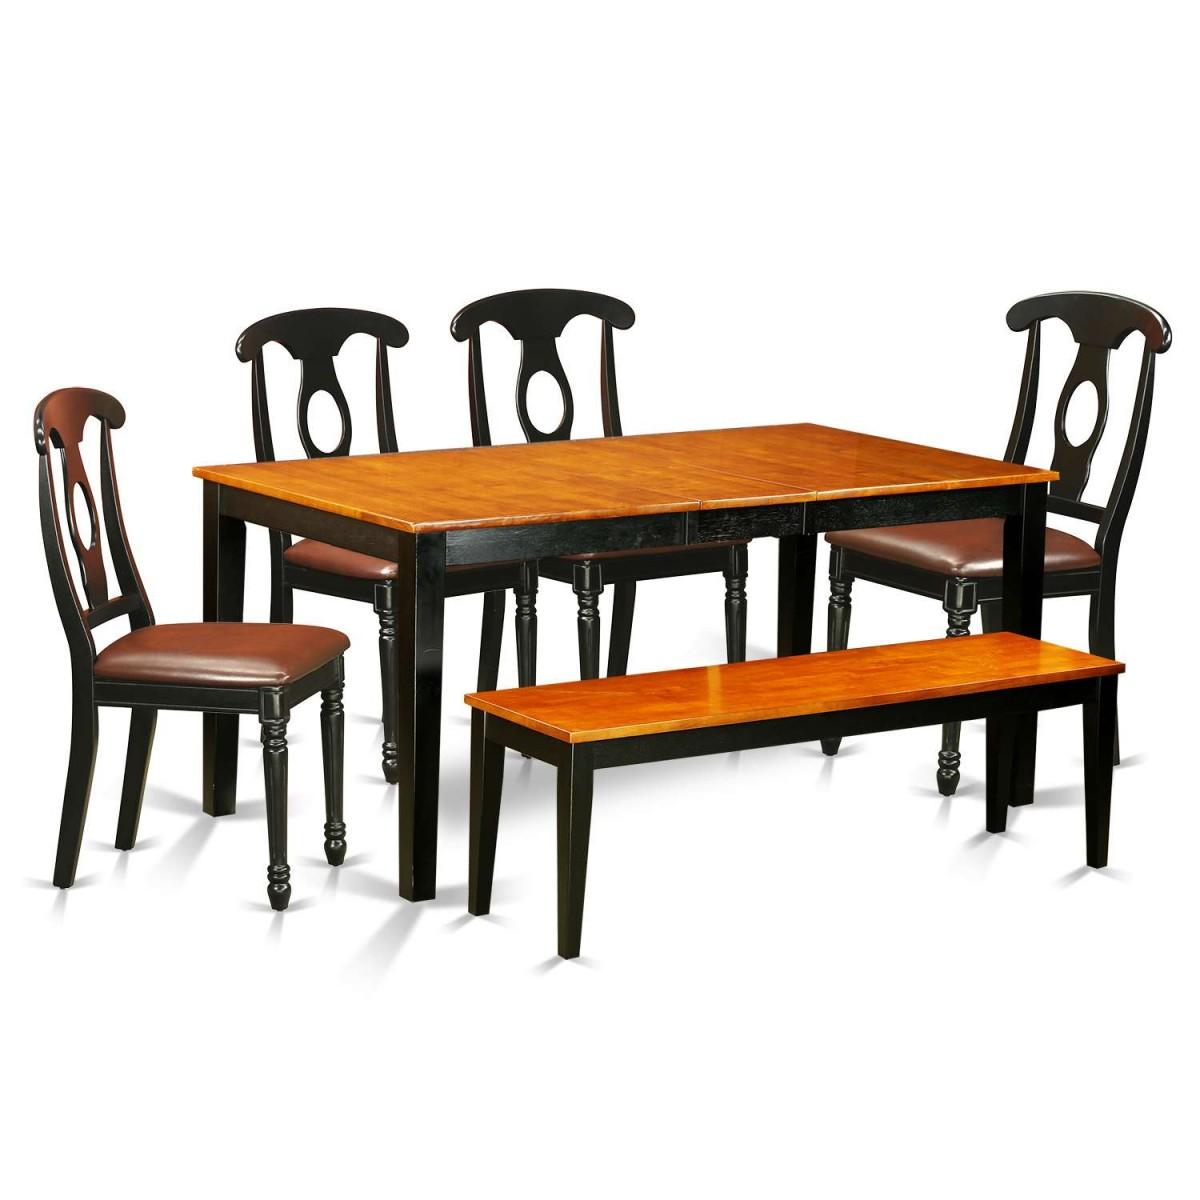 East West Nicoli 6 Piece Dining Set: East West Furniture Nicoli 6 Piece Dining Set